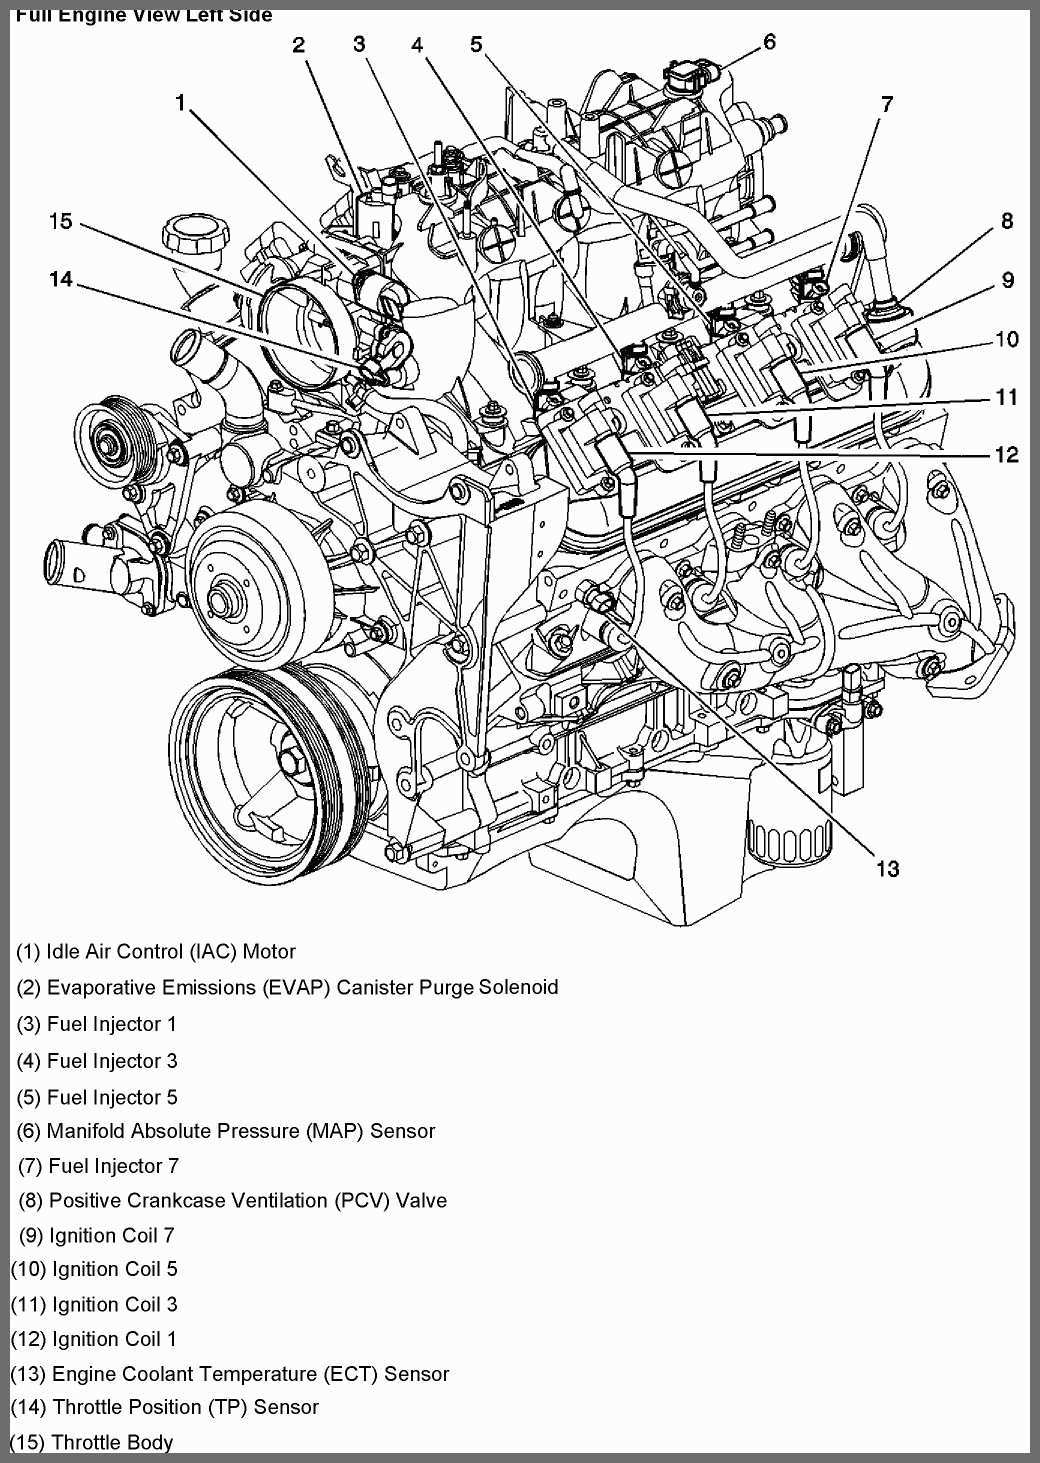 [SCHEMATICS_48EU]  Chevrolet Engine Diagram Full 1600 Cc Volkswagen Sand Rail Wiring Diagram -  vwc.kelengkeng.astrea-construction.fr | Chevy 350 Coil Wiring Diagram |  | ASTREA CONSTRUCTION